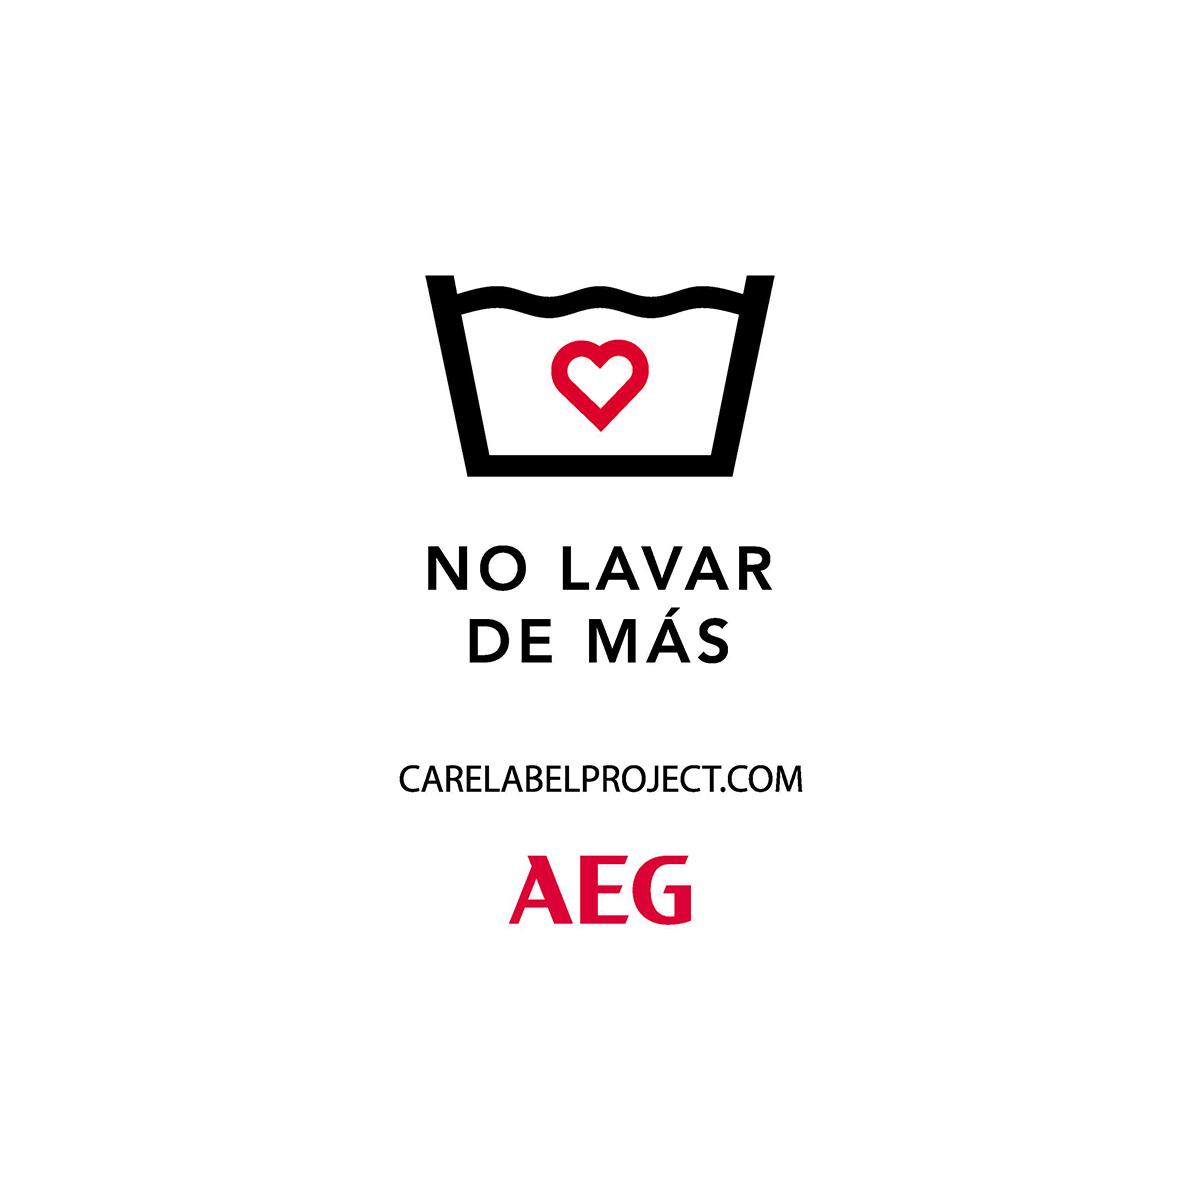 #CareLabelProject de AEG